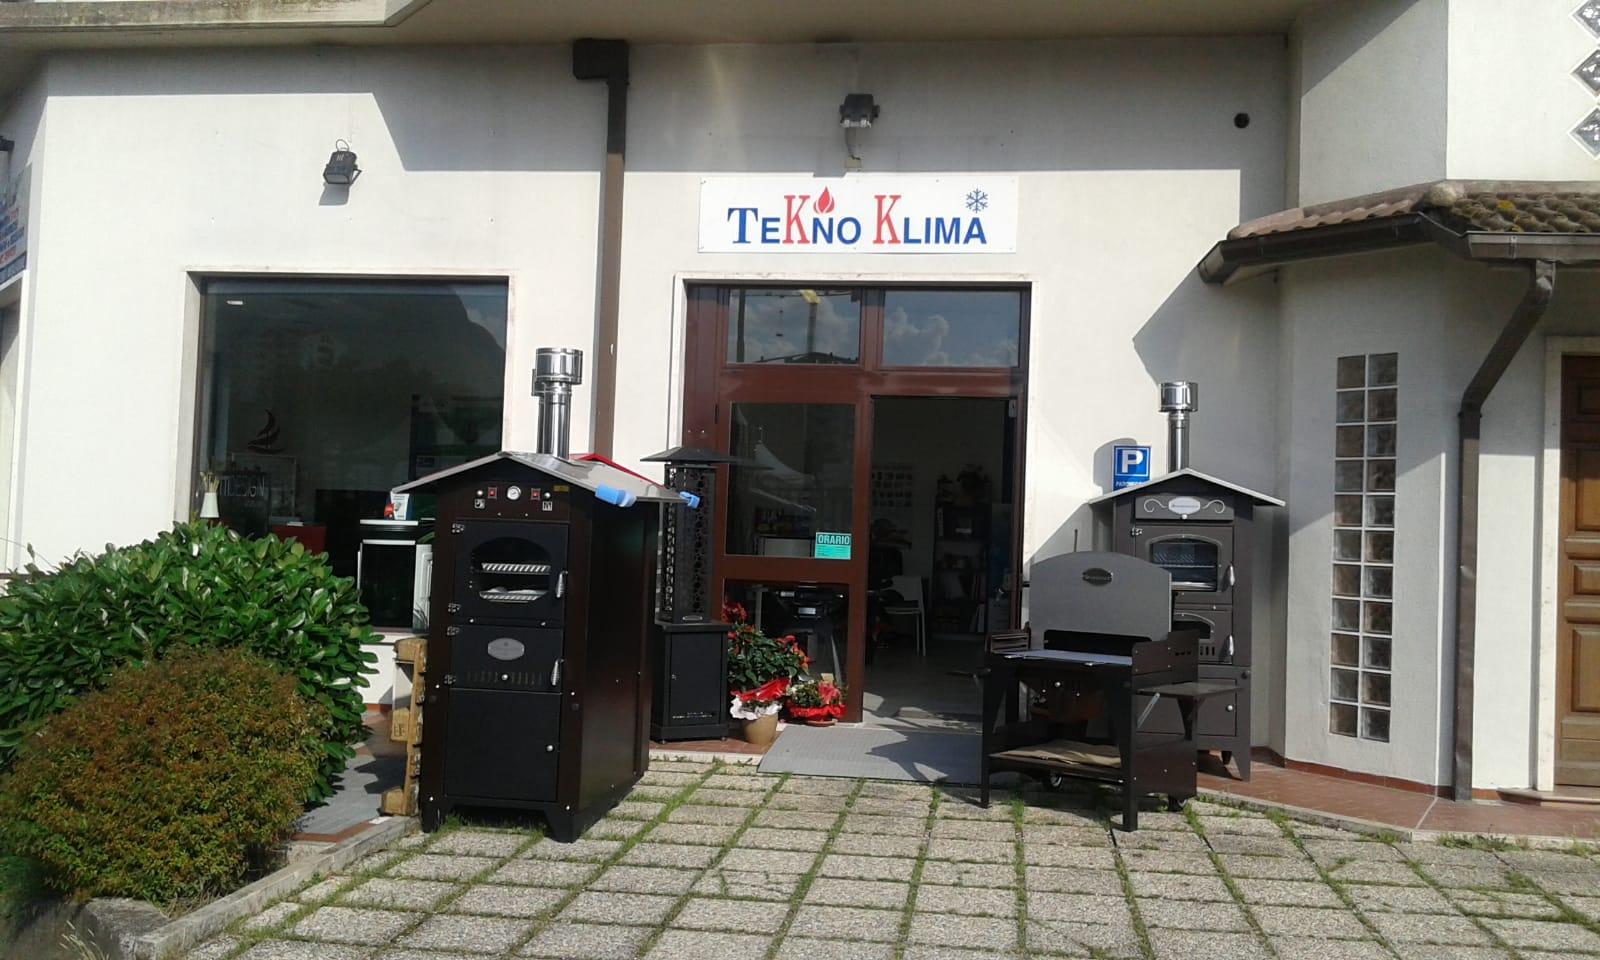 Tekno Klima di Maurelli Federico a Terni